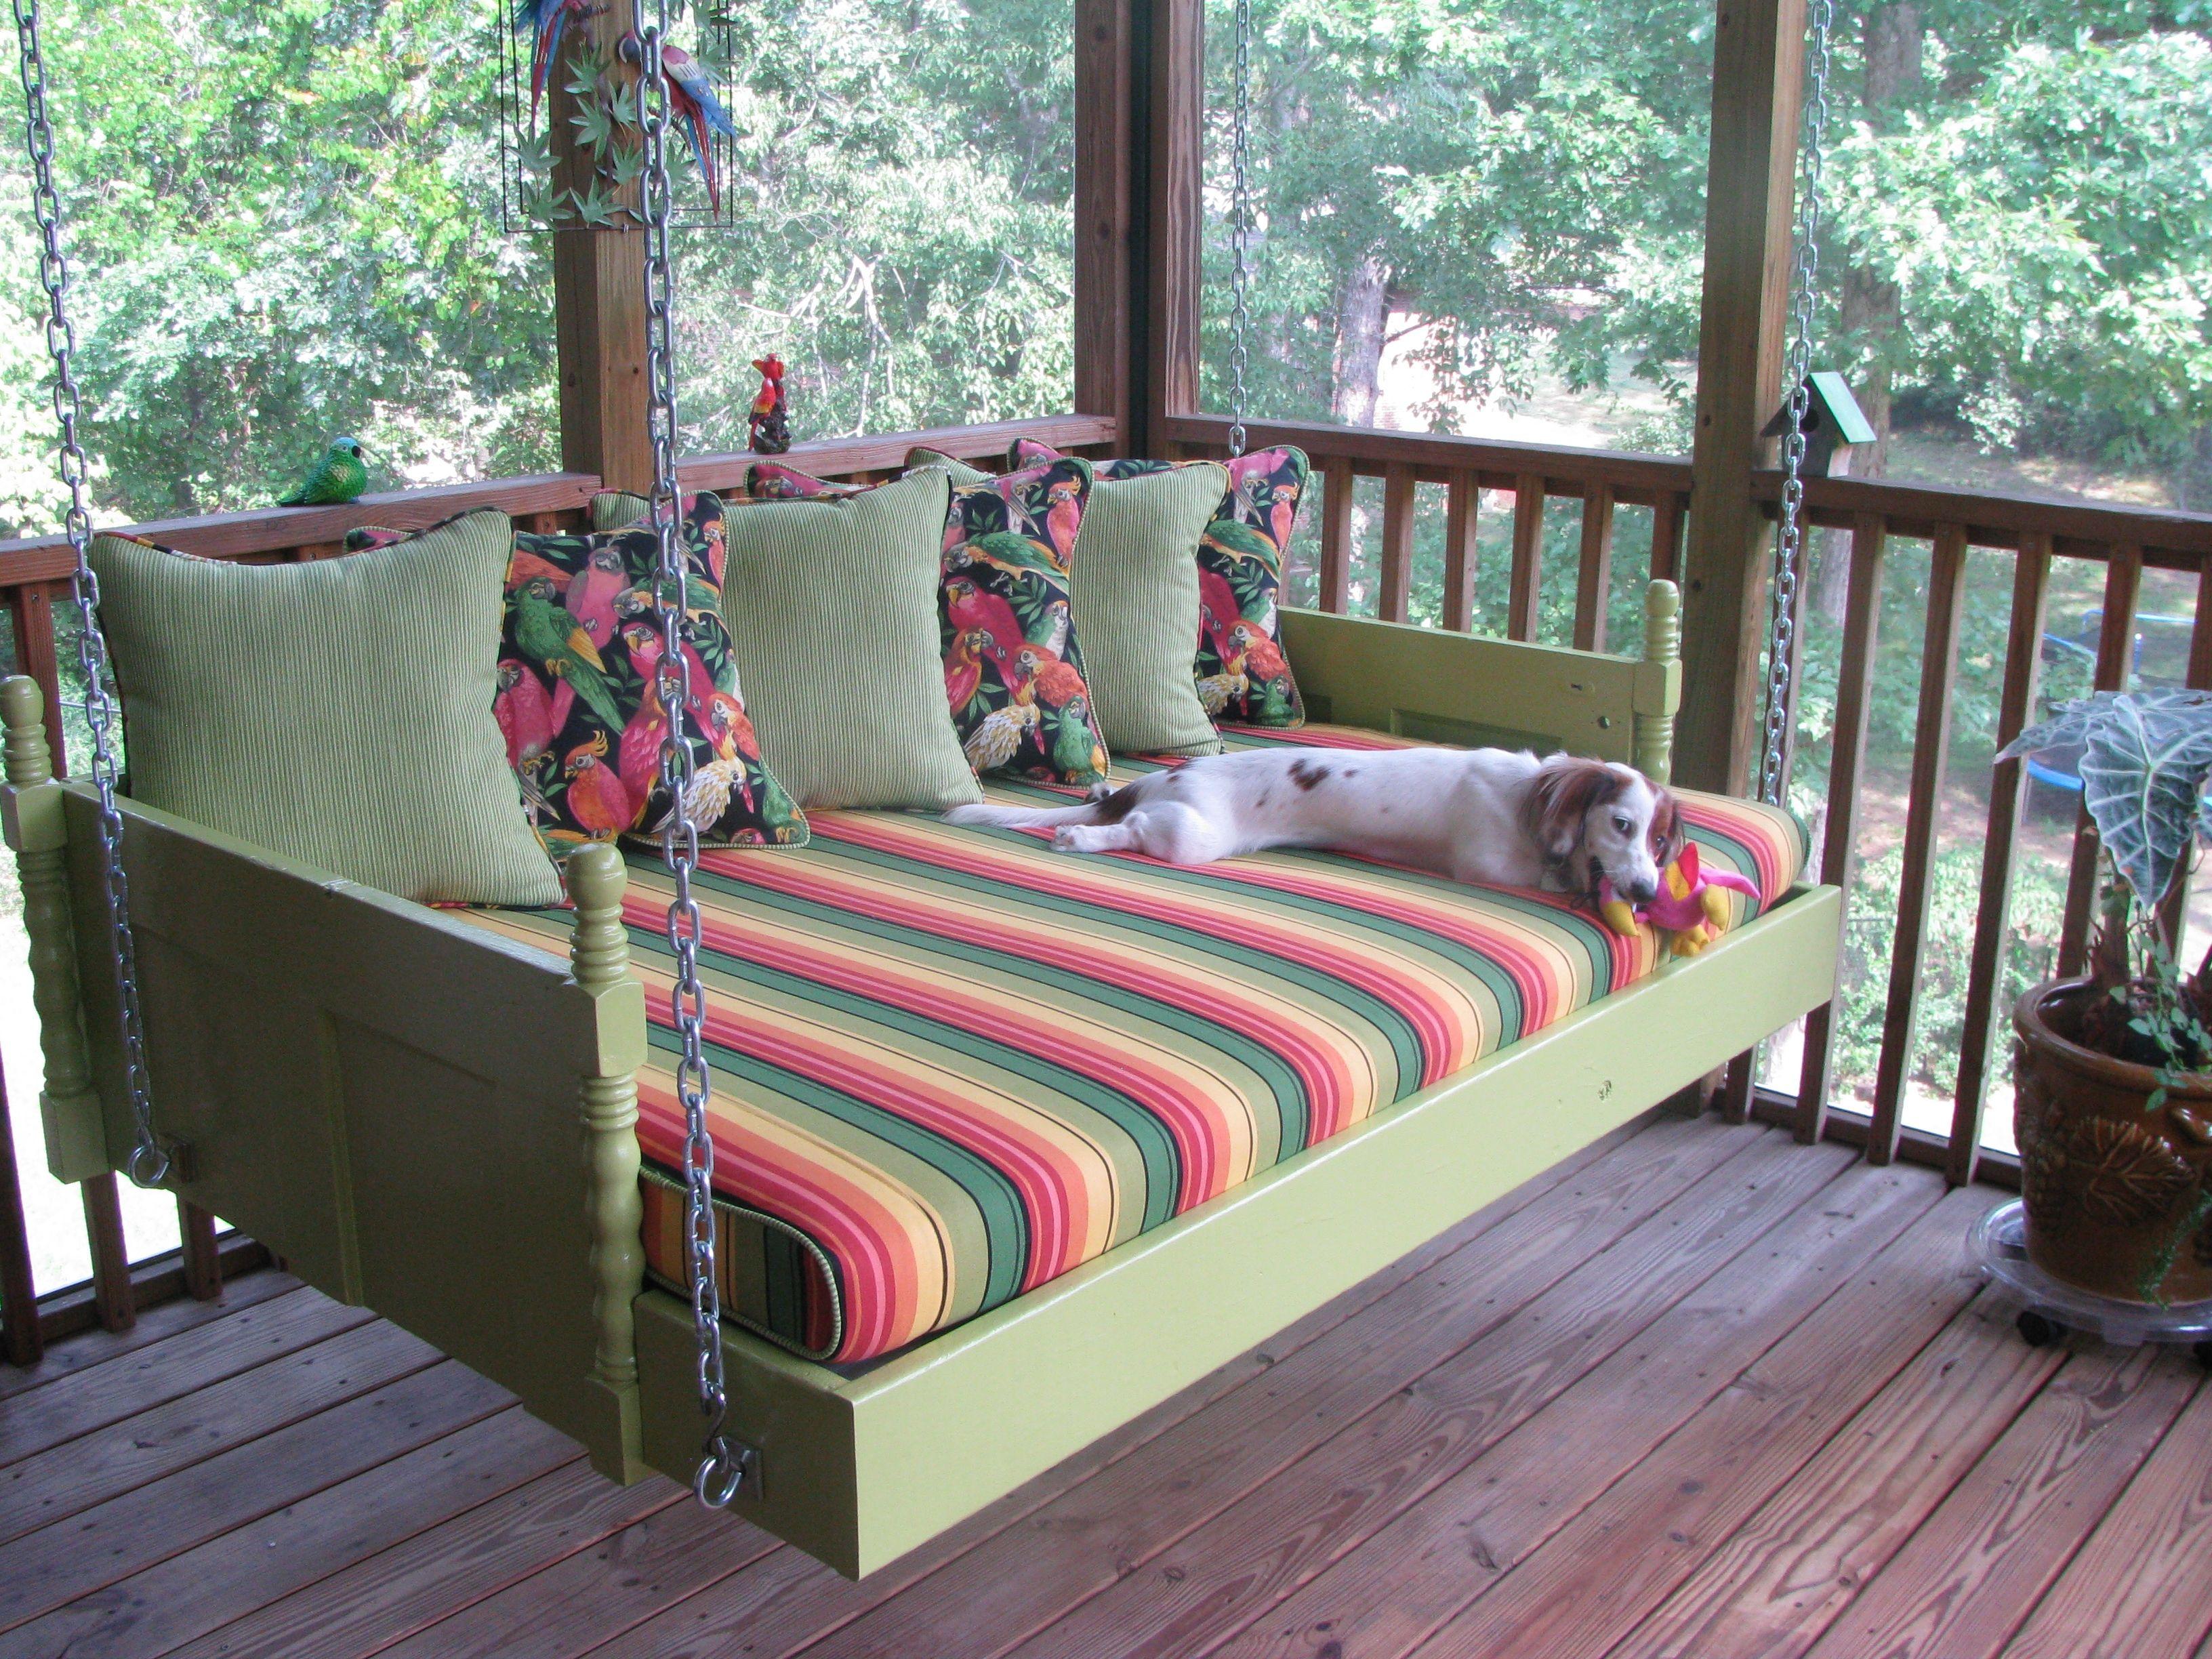 Sofa Porch Swings | ... U003e Swings : 832: Home Furnishingsu003eFurniture